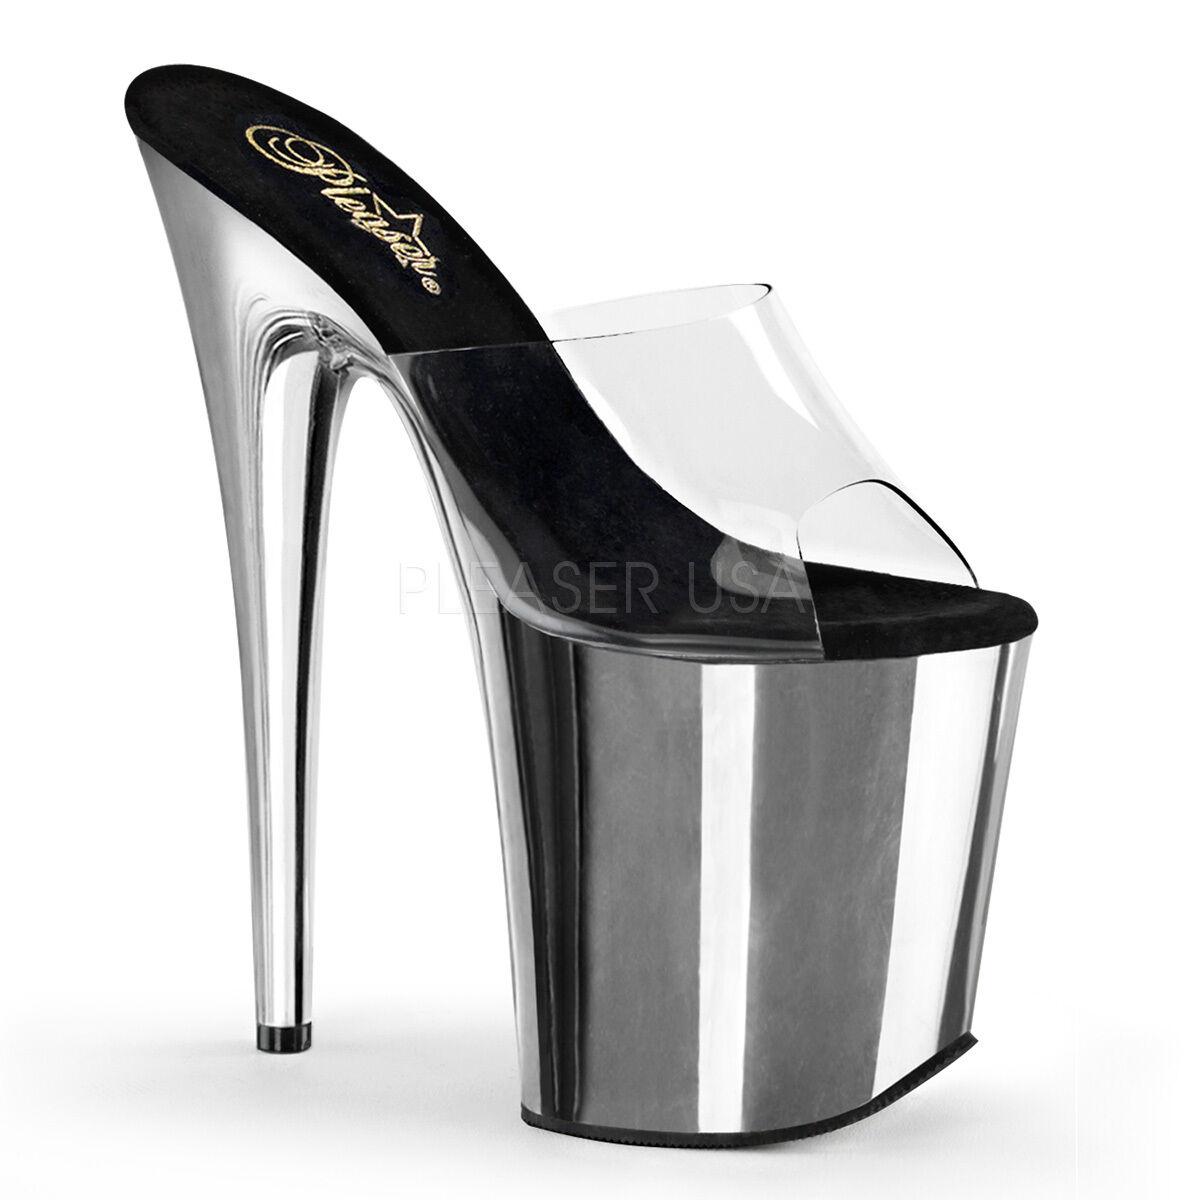 Descuento barato Pleaser Flamingo-801 Shoes Platform Sandals Mules Slip On Stilettos High Heels